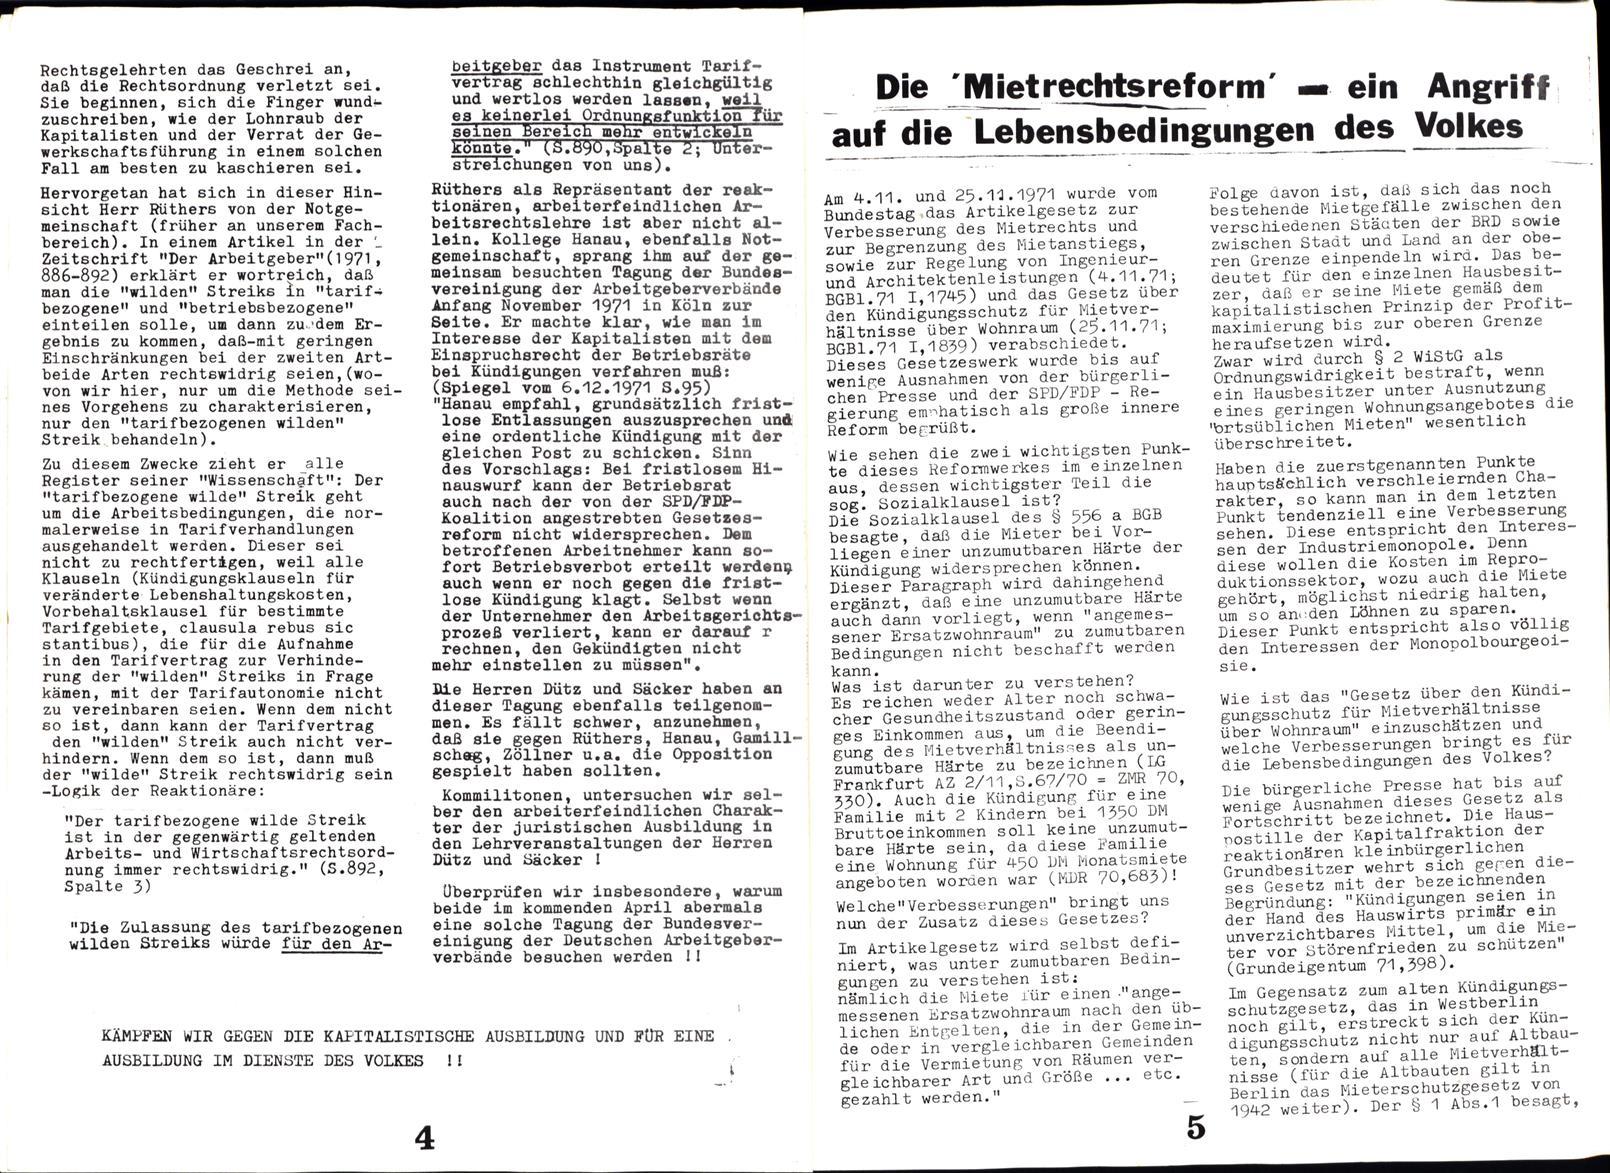 Berlin_KSV_Jura_Studentenpresse_19720115_06_03